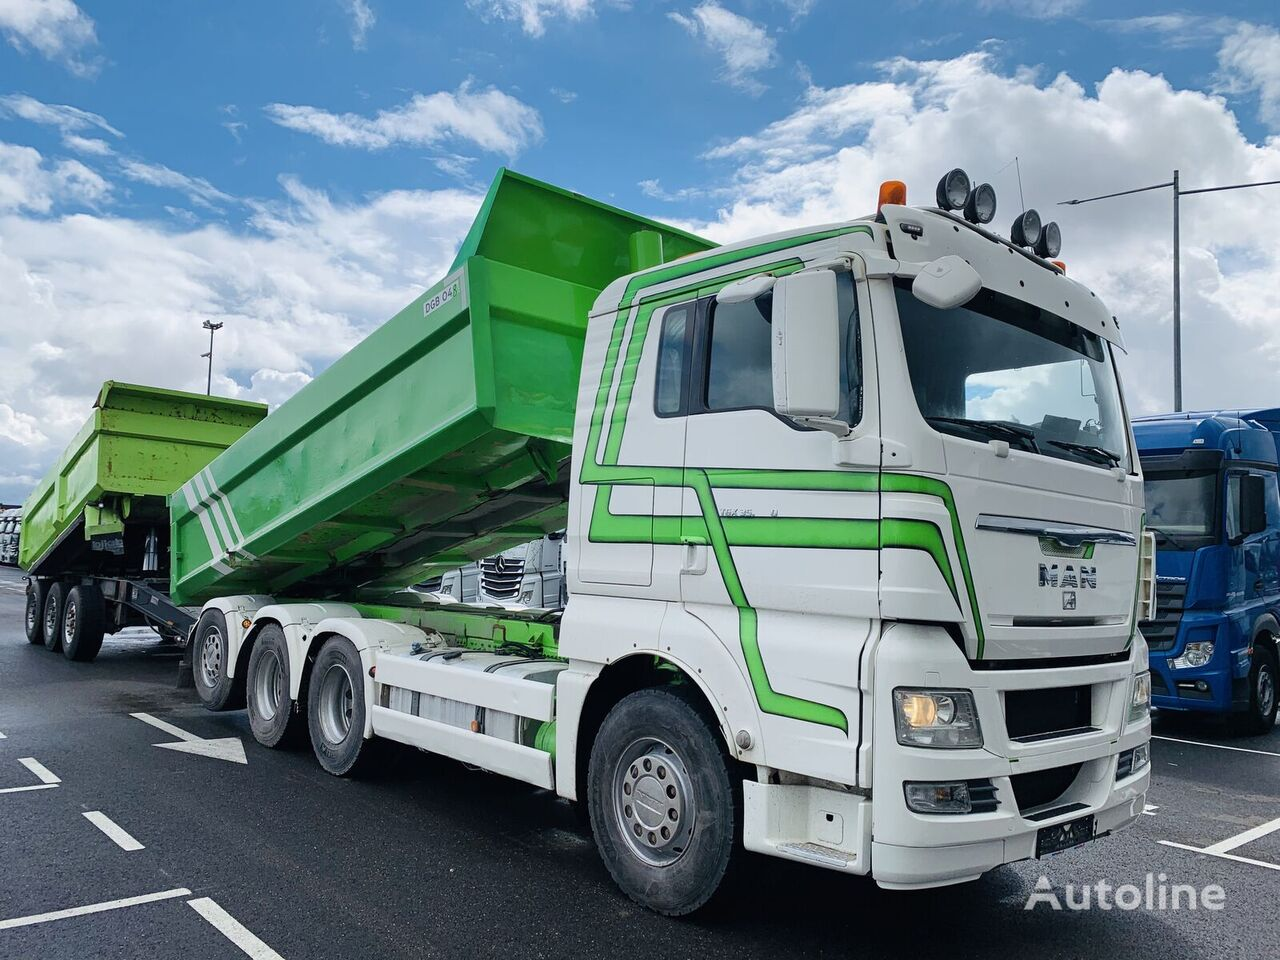 MAN TGX 35.540 8x4 + Istrail dump truck + dump trailer